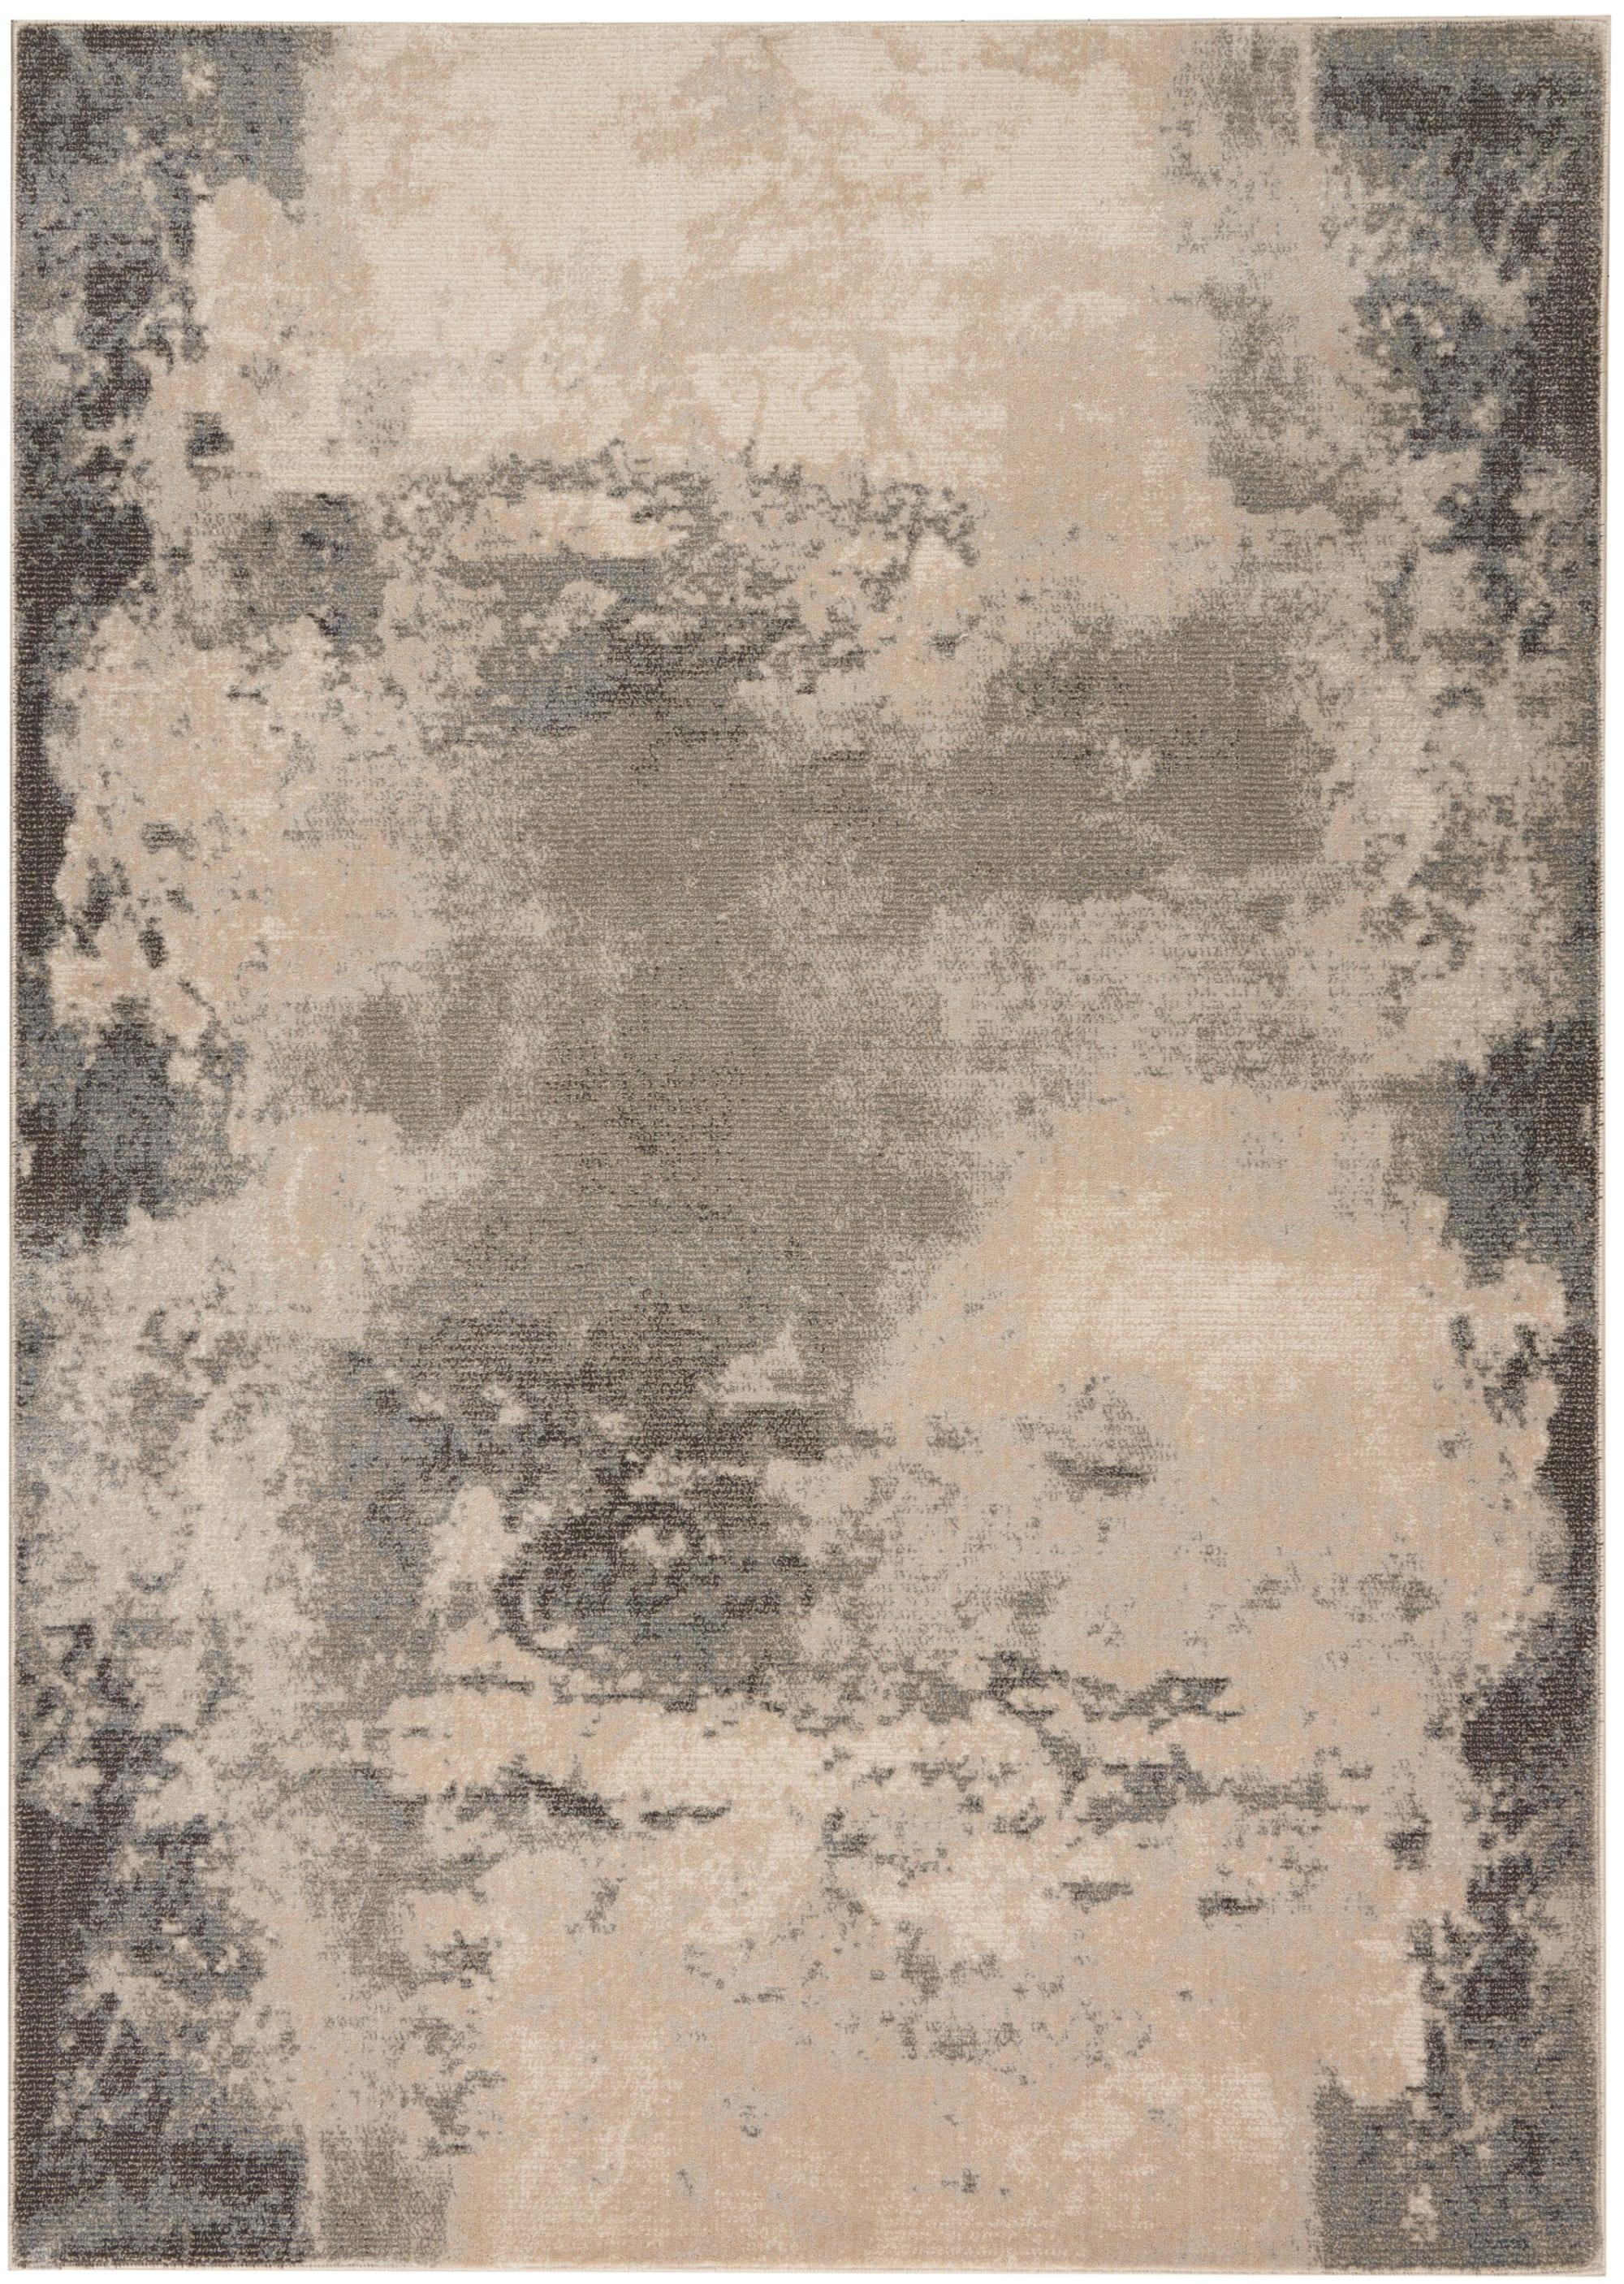 Maxell Rug MAE12 Ivory/Grey